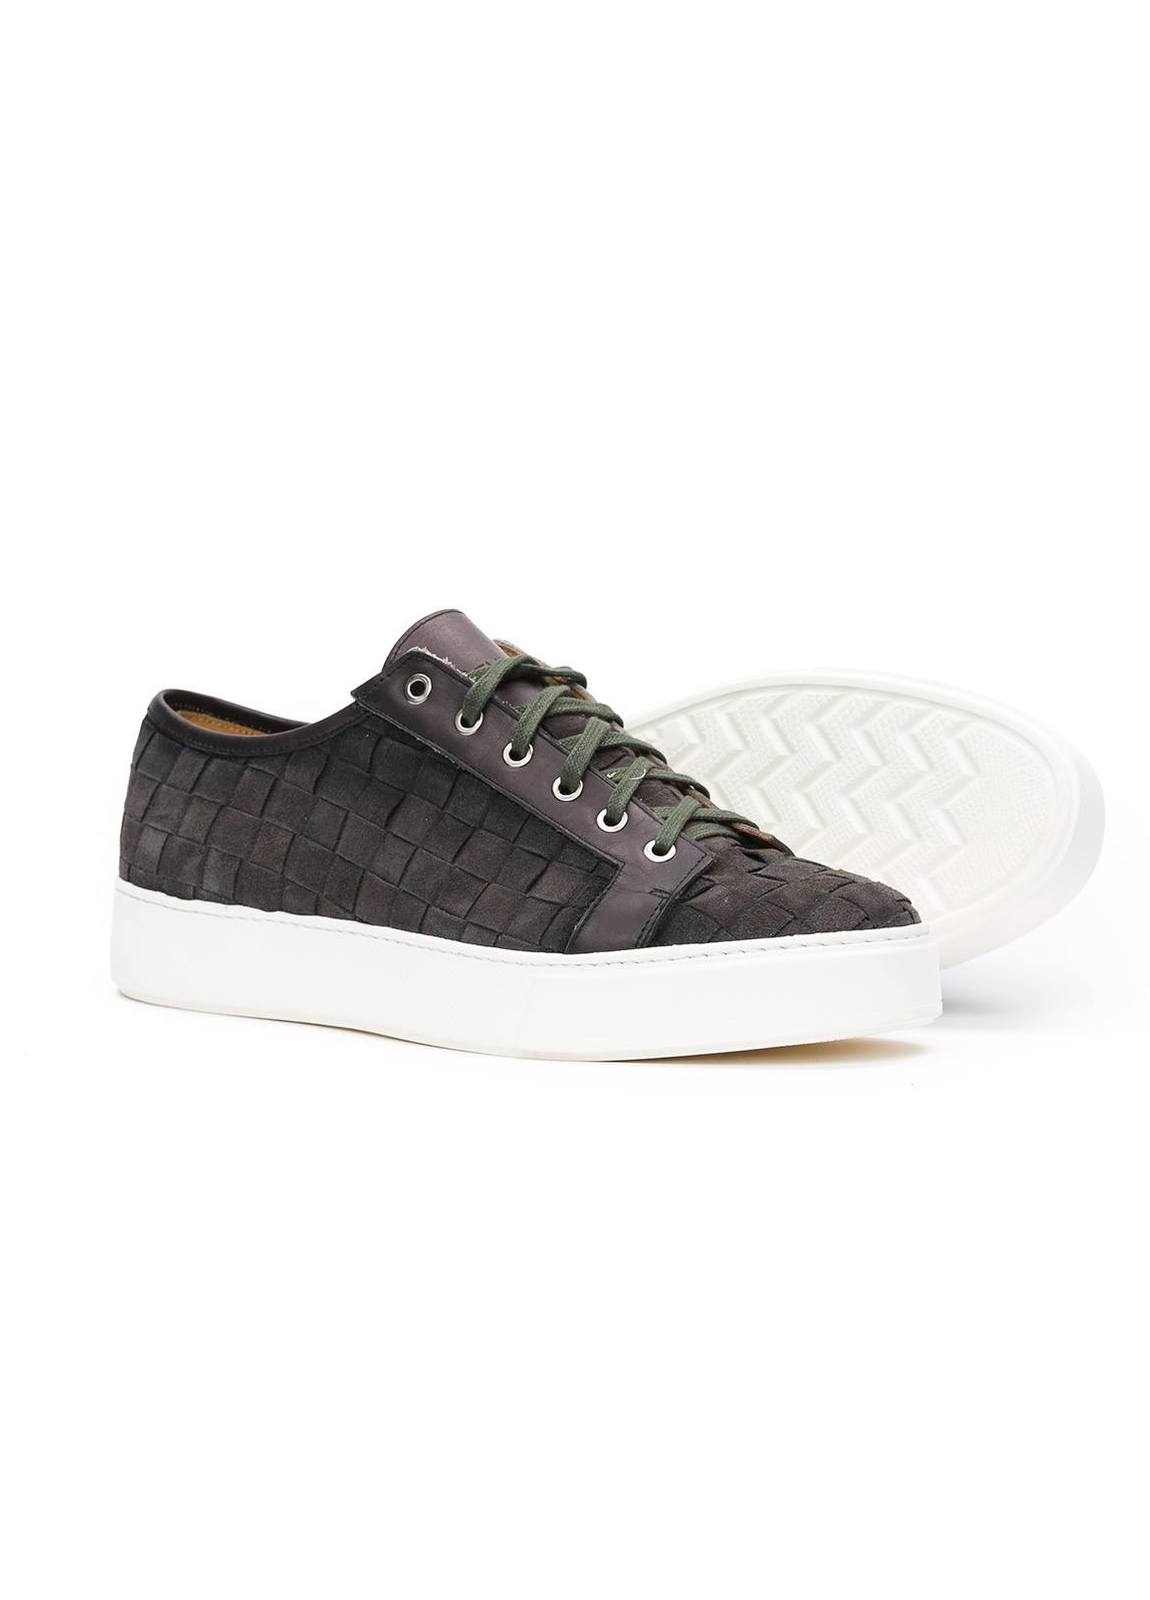 Zapato Sport Wear color gris, 100% Serraje. - Ítem1